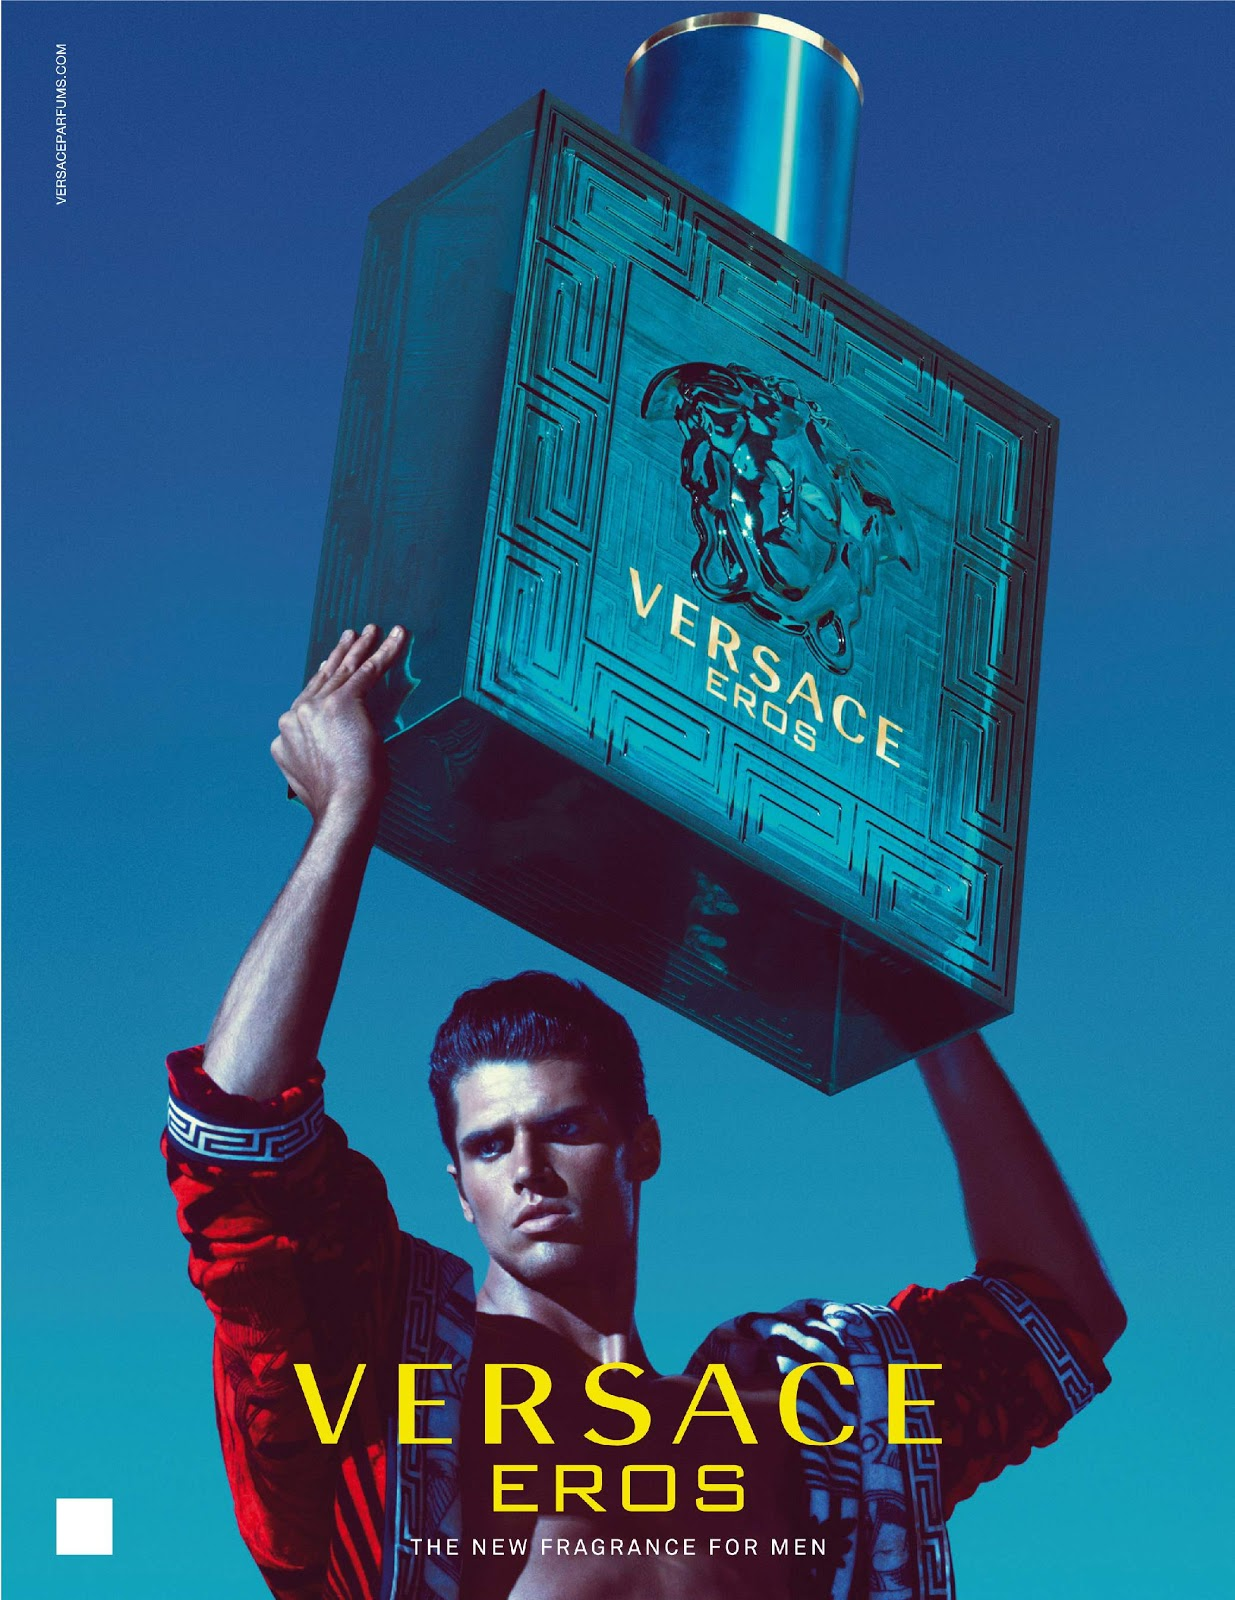 Versace-Eros Banner2